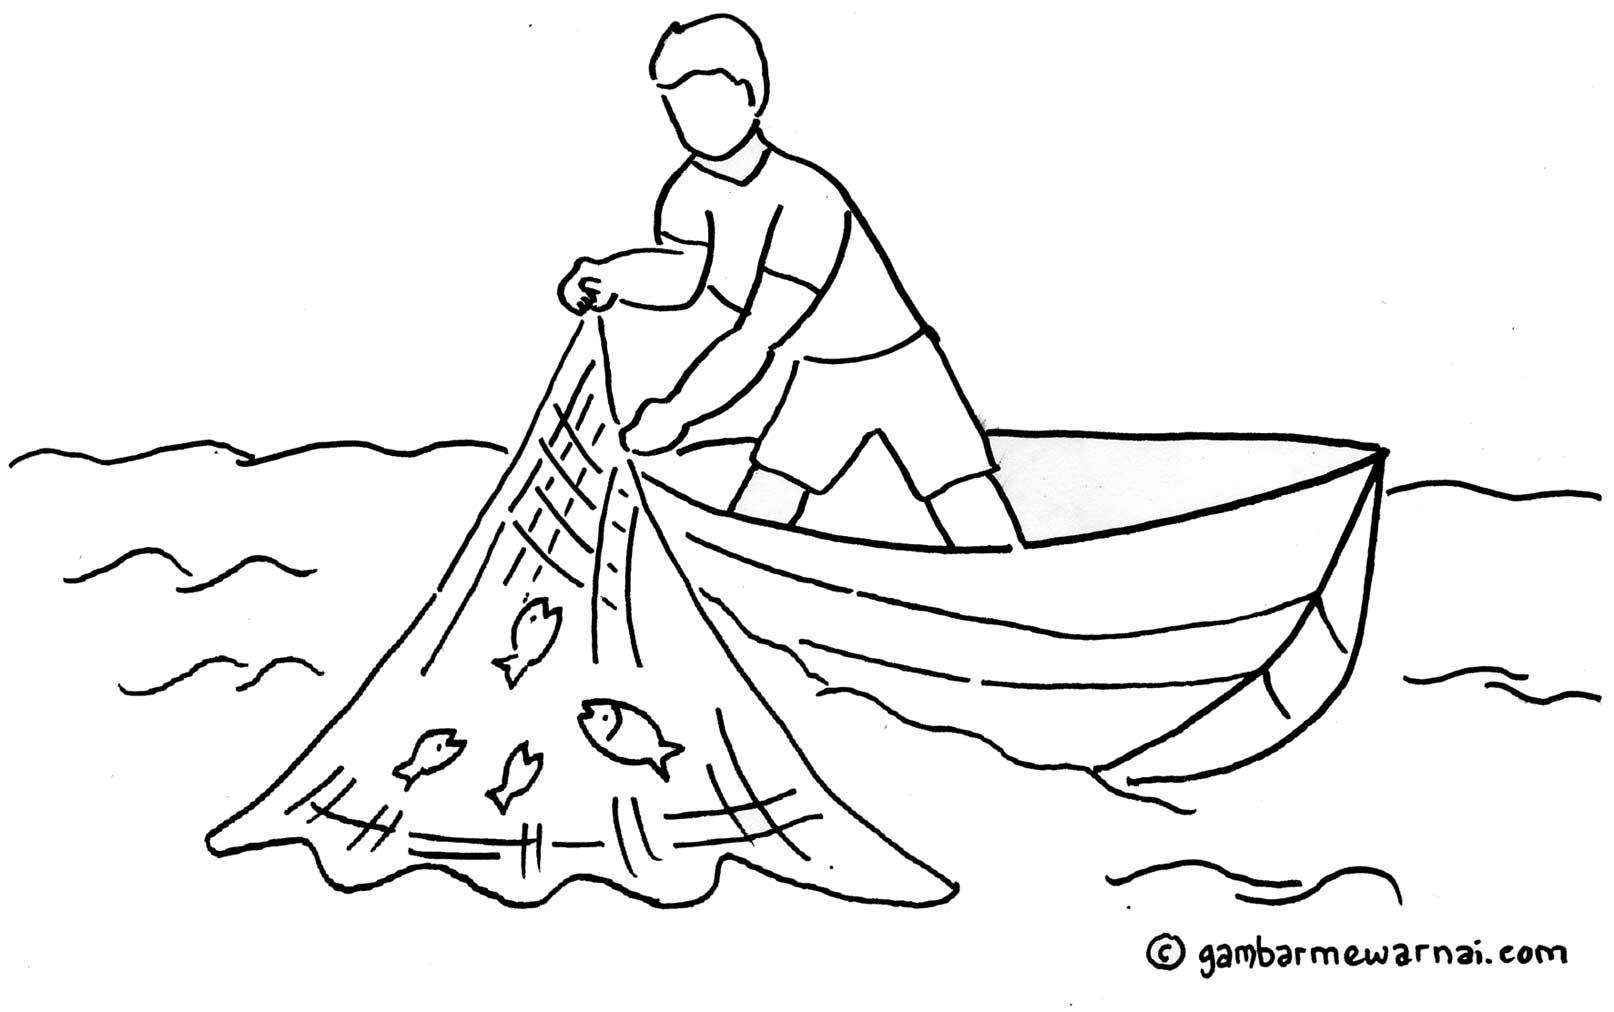 gambar mewarnai nelayan – contoh gambar nelayan sedang menjaring ...